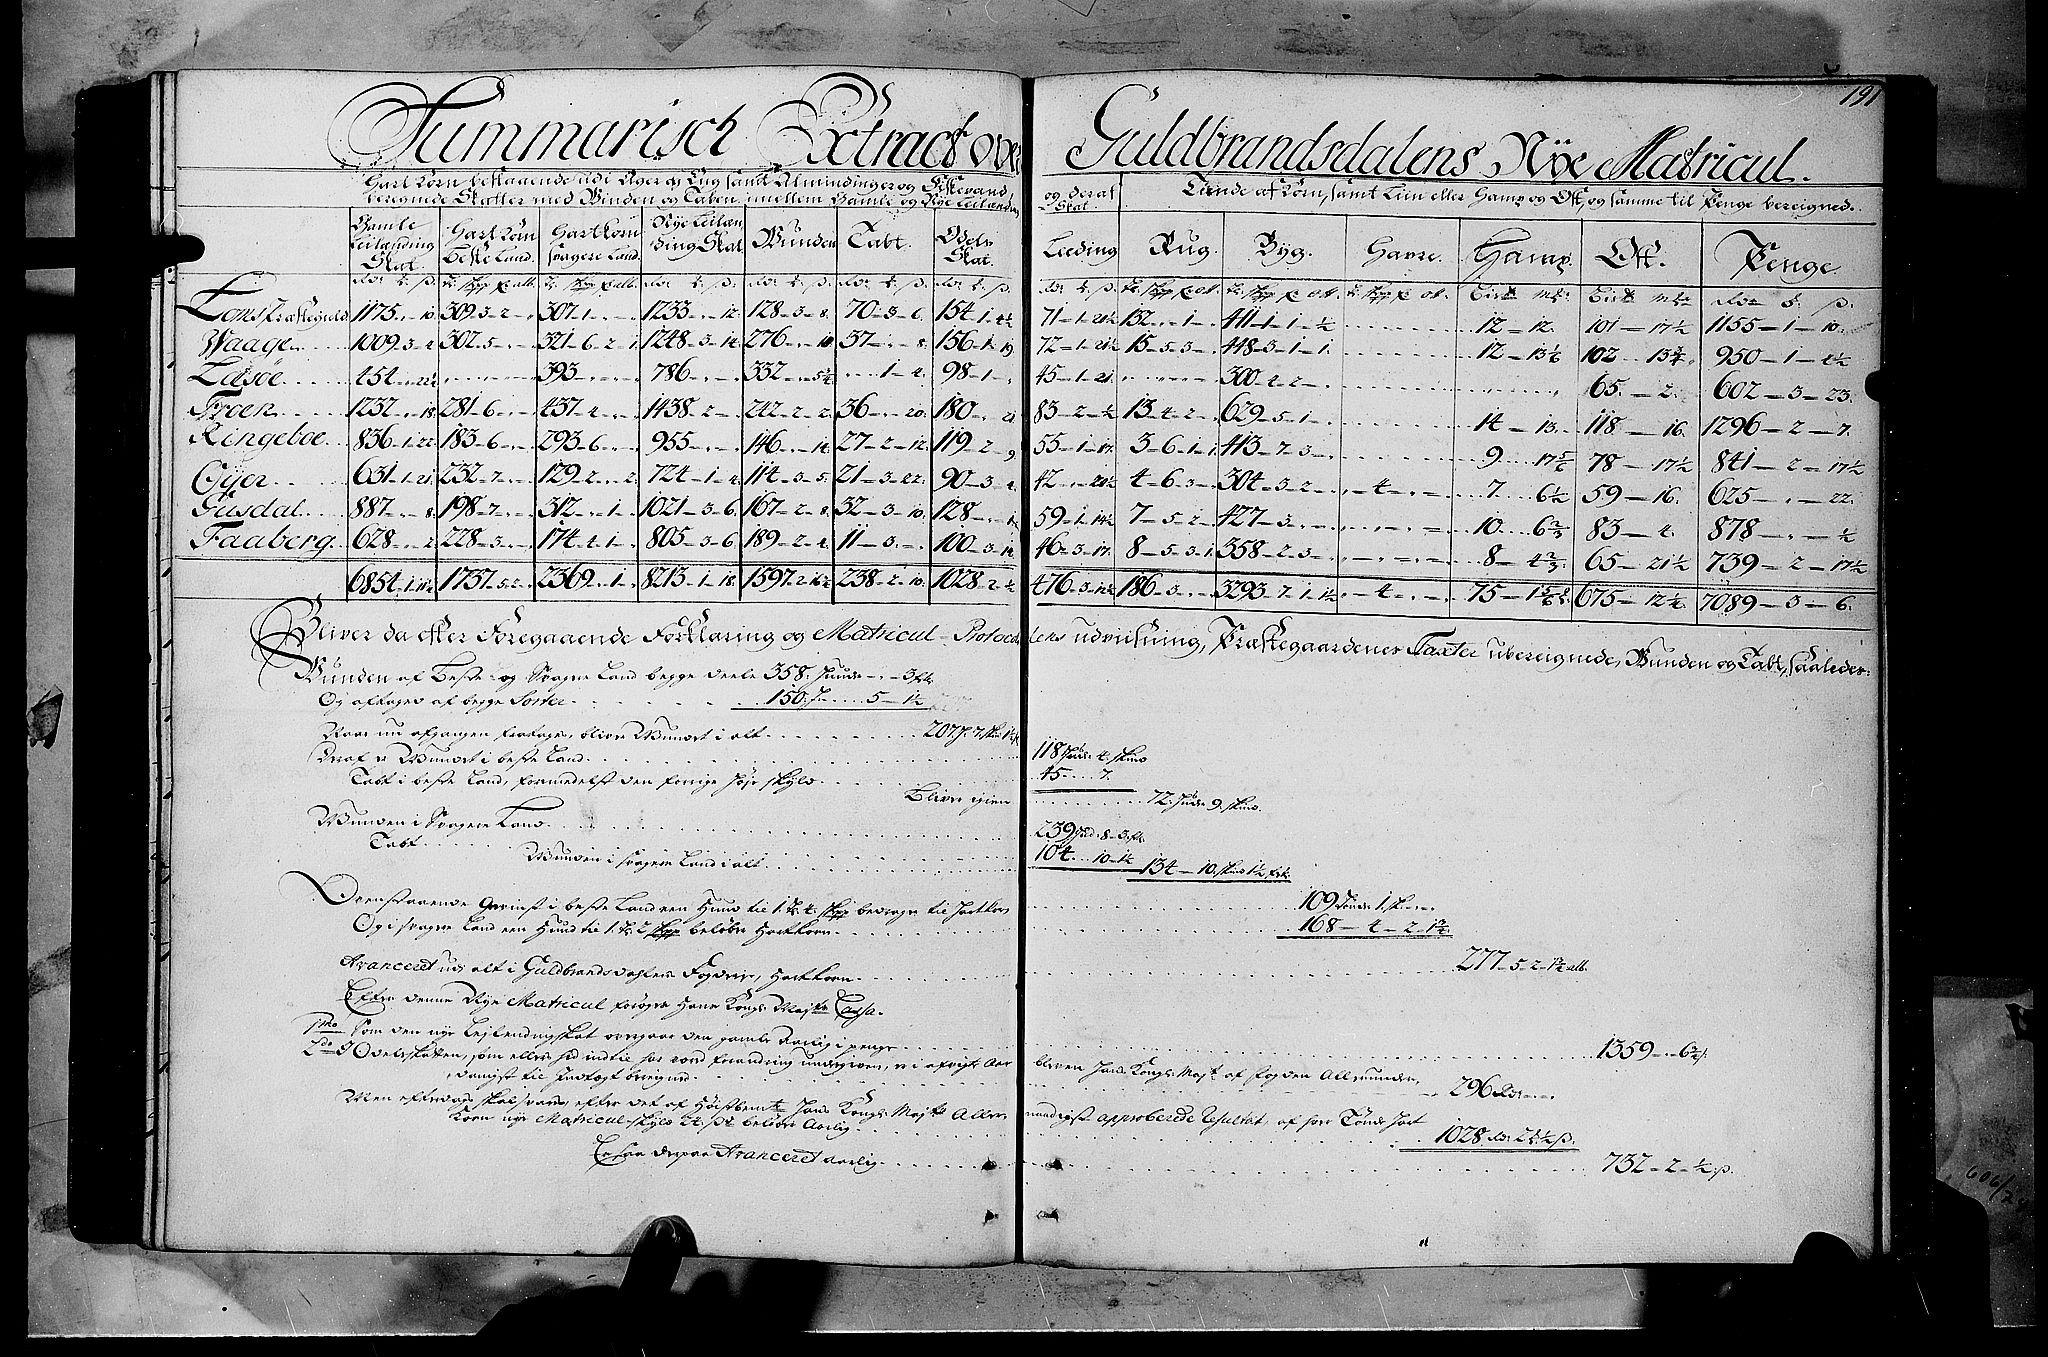 RA, Rentekammeret inntil 1814, Realistisk ordnet avdeling, N/Nb/Nbf/L0108: Gudbrandsdalen matrikkelprotokoll, 1723, s. 190b-191a